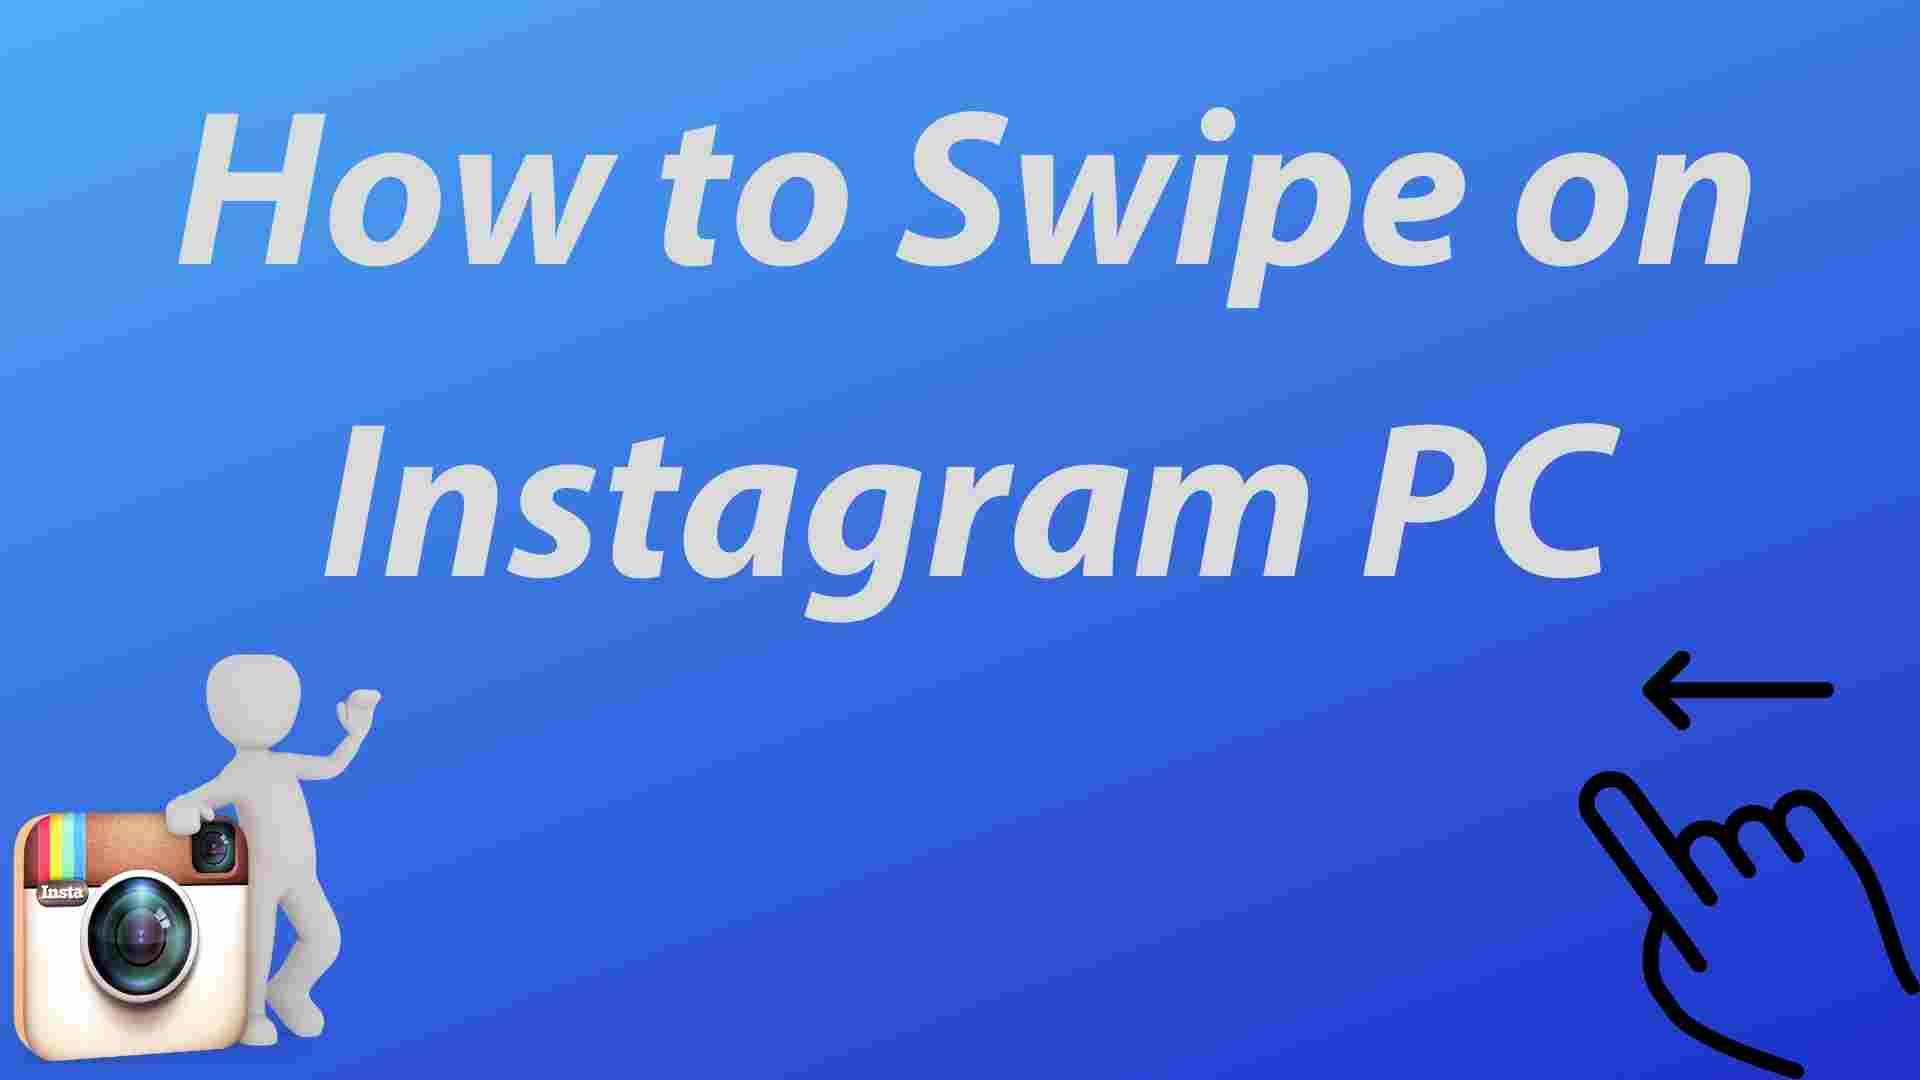 How to Swipe on Instagram PC